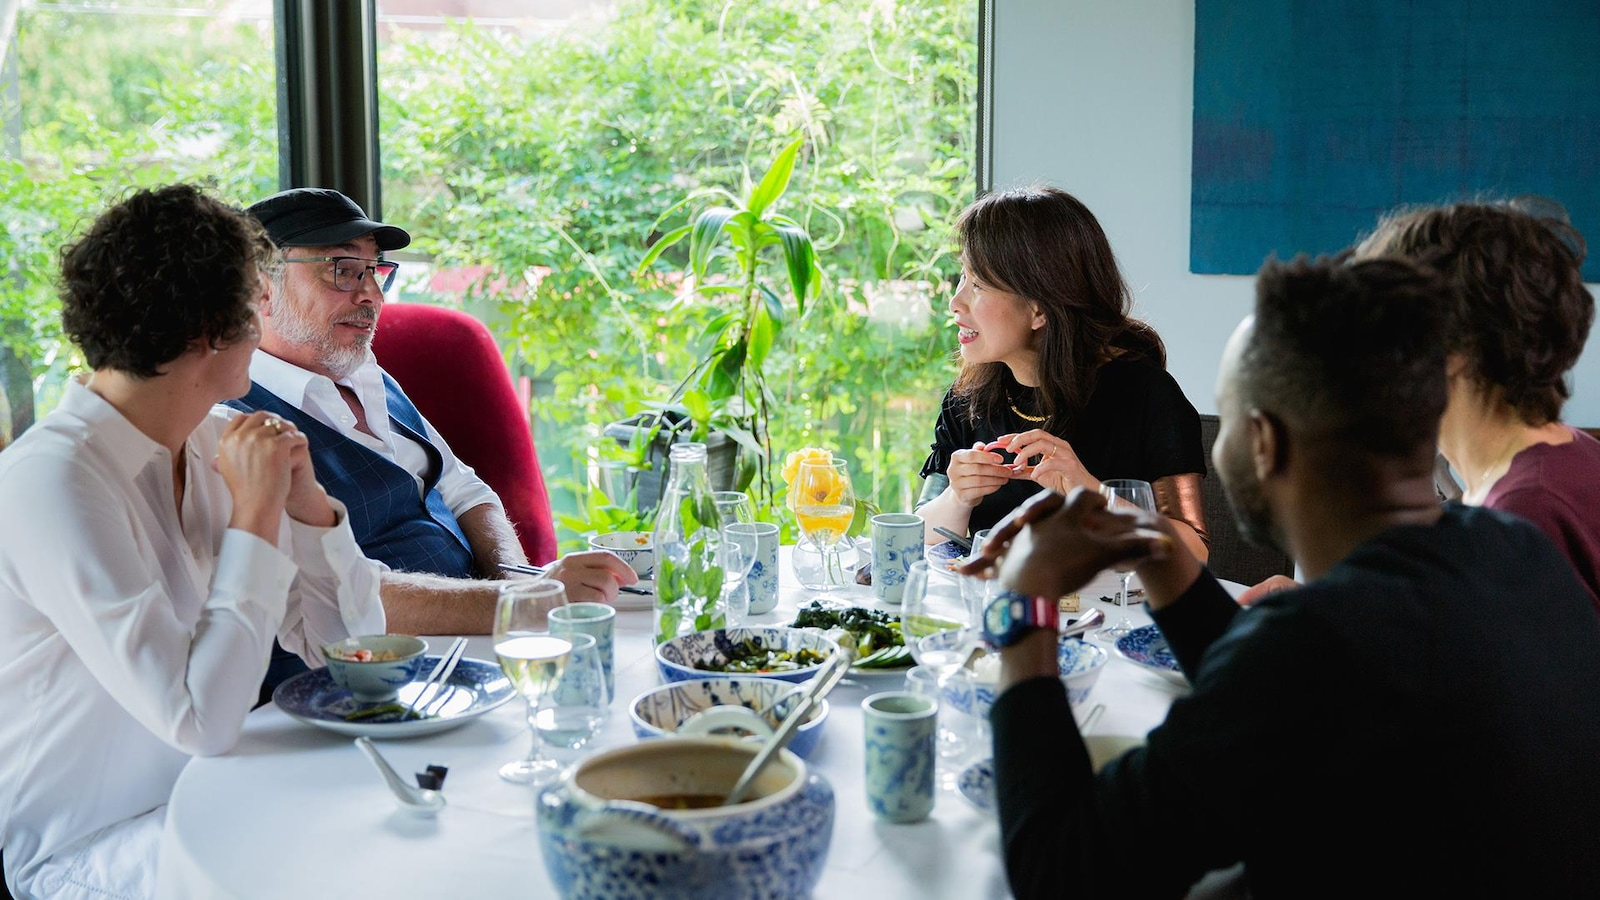 Kim Thúy discute à la table avec ses invités, dont Christian Bégin.